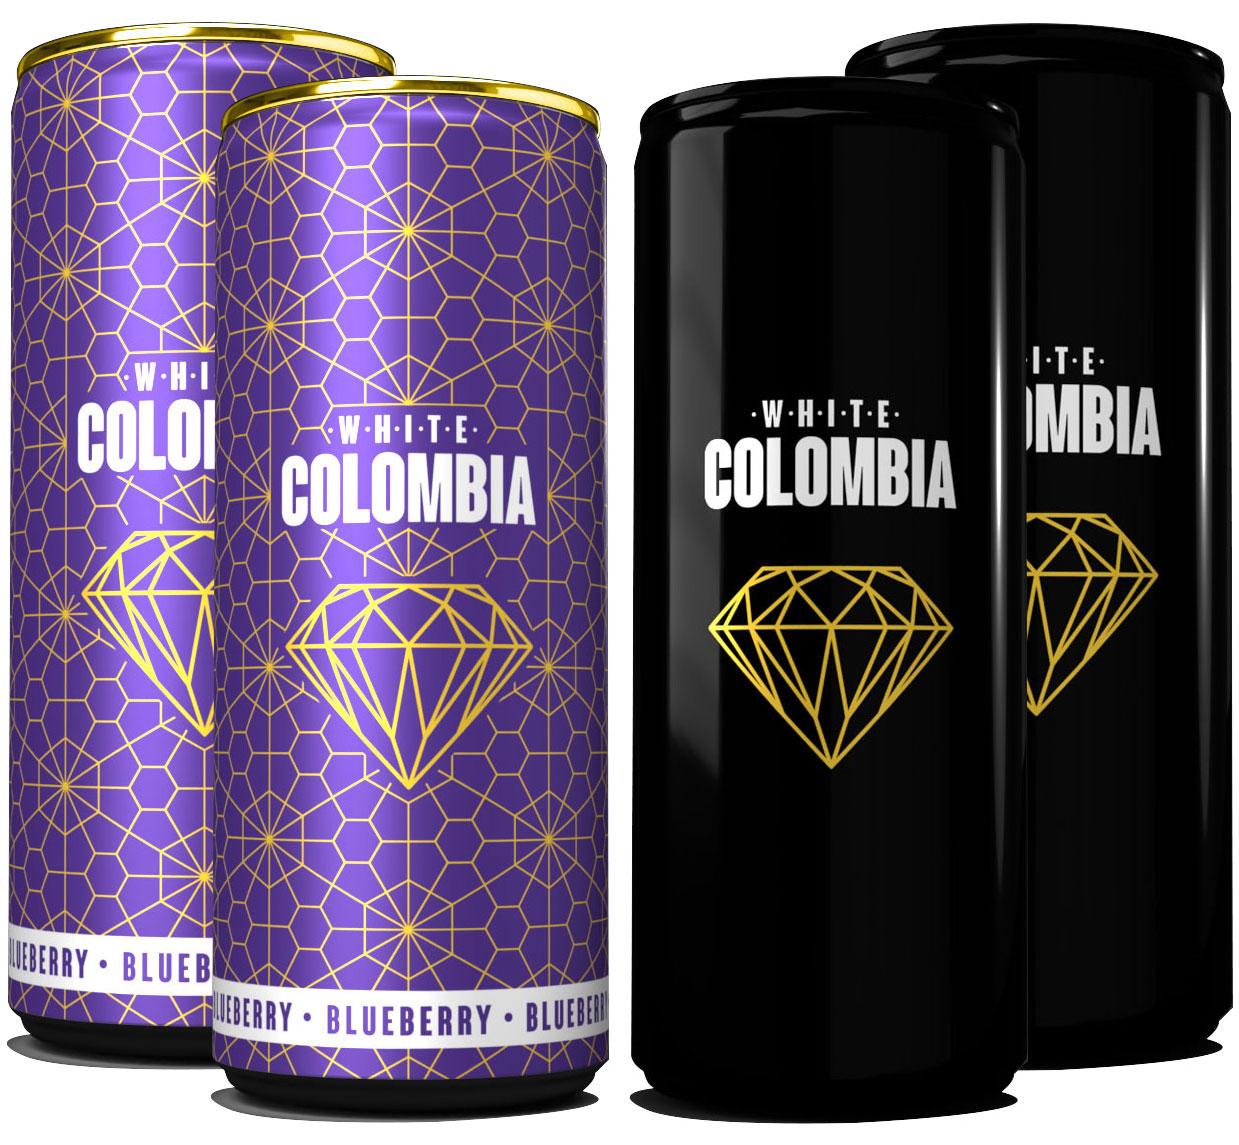 White Colombia Mix Set - Classic + Blueberry - 4x 250ml inkl. Pfand EINWEG